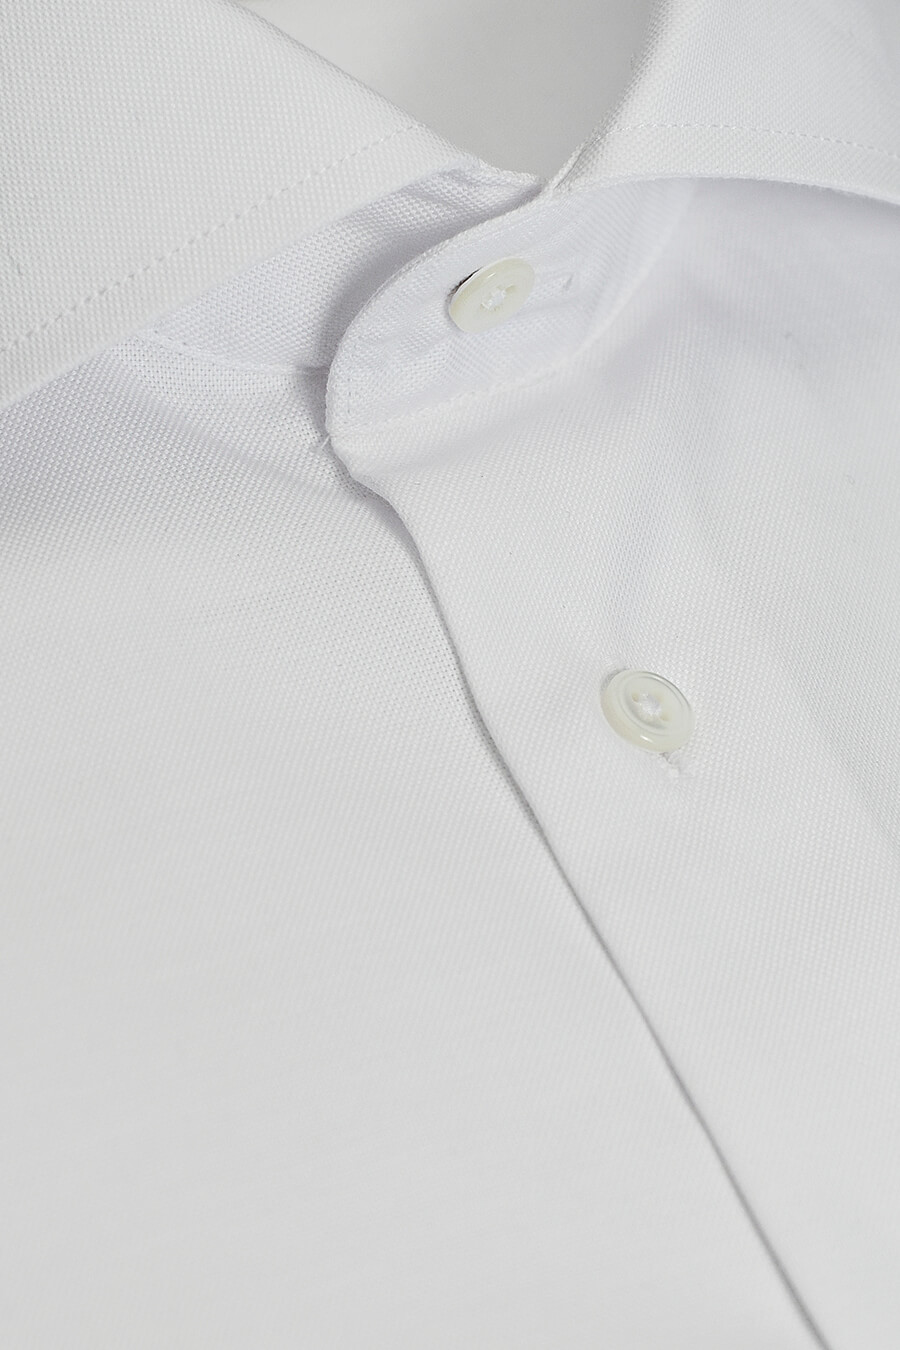 Hvit ensfarget skjorte fra Viero Milano